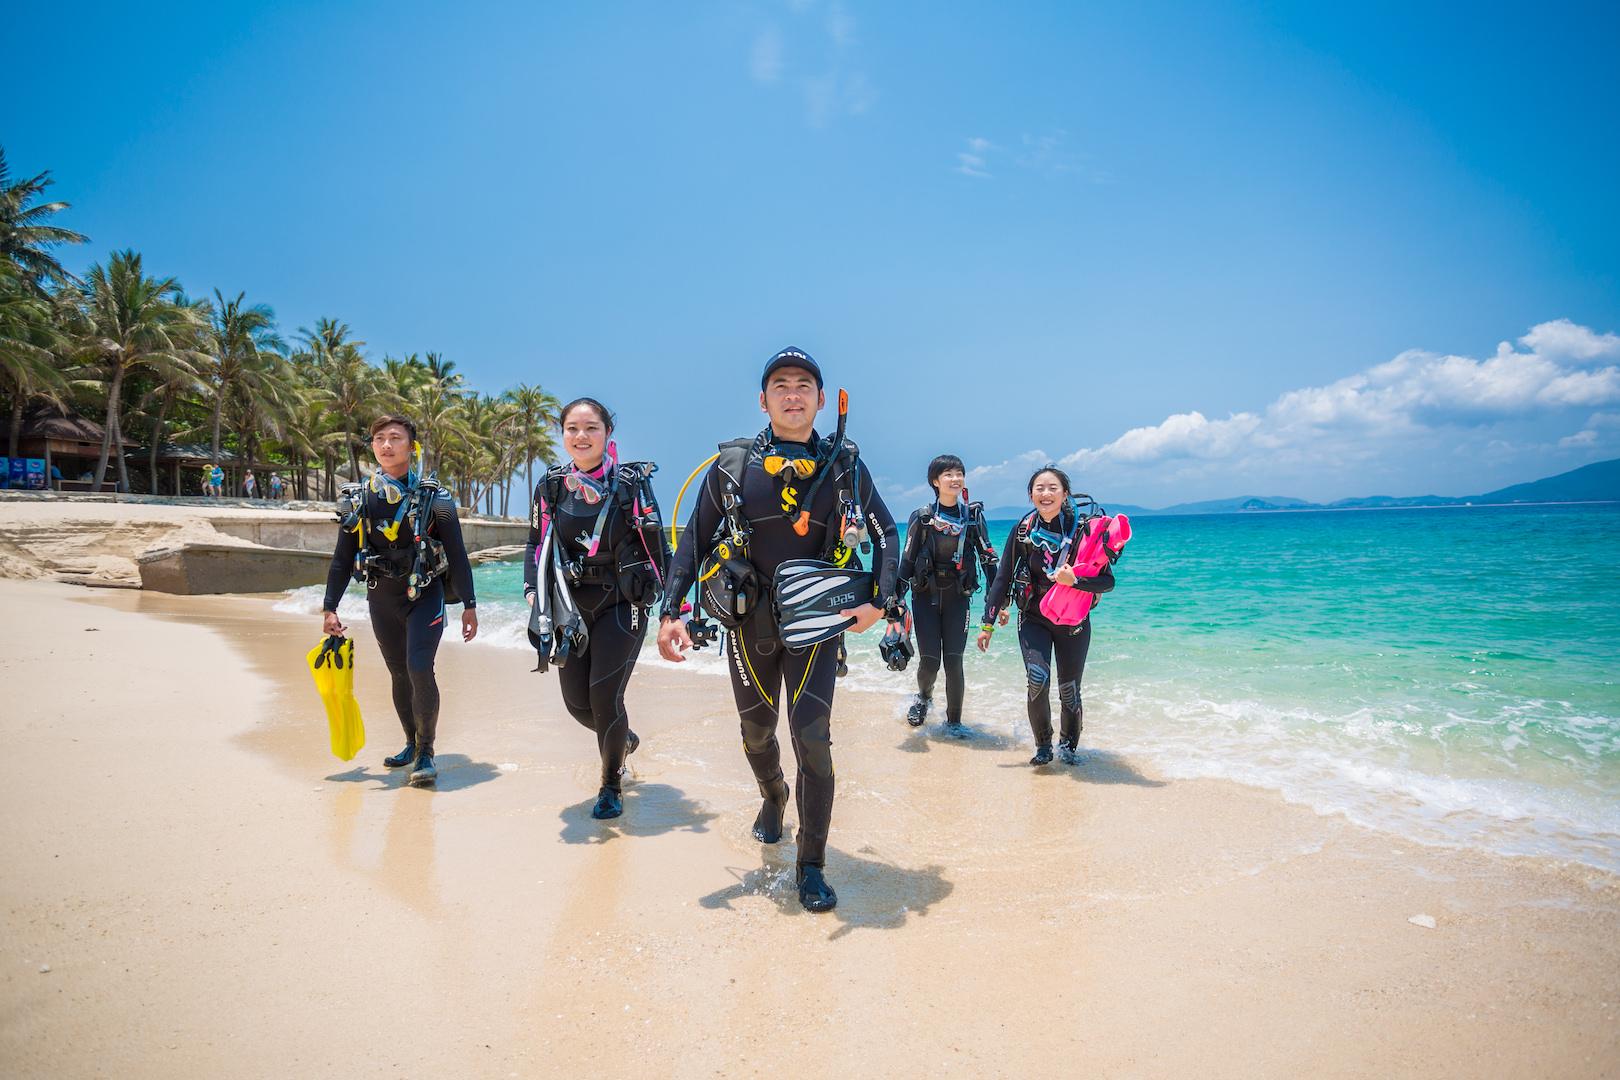 Wave Break Island Discover SCUBA Diving Tour - GOLD COAST